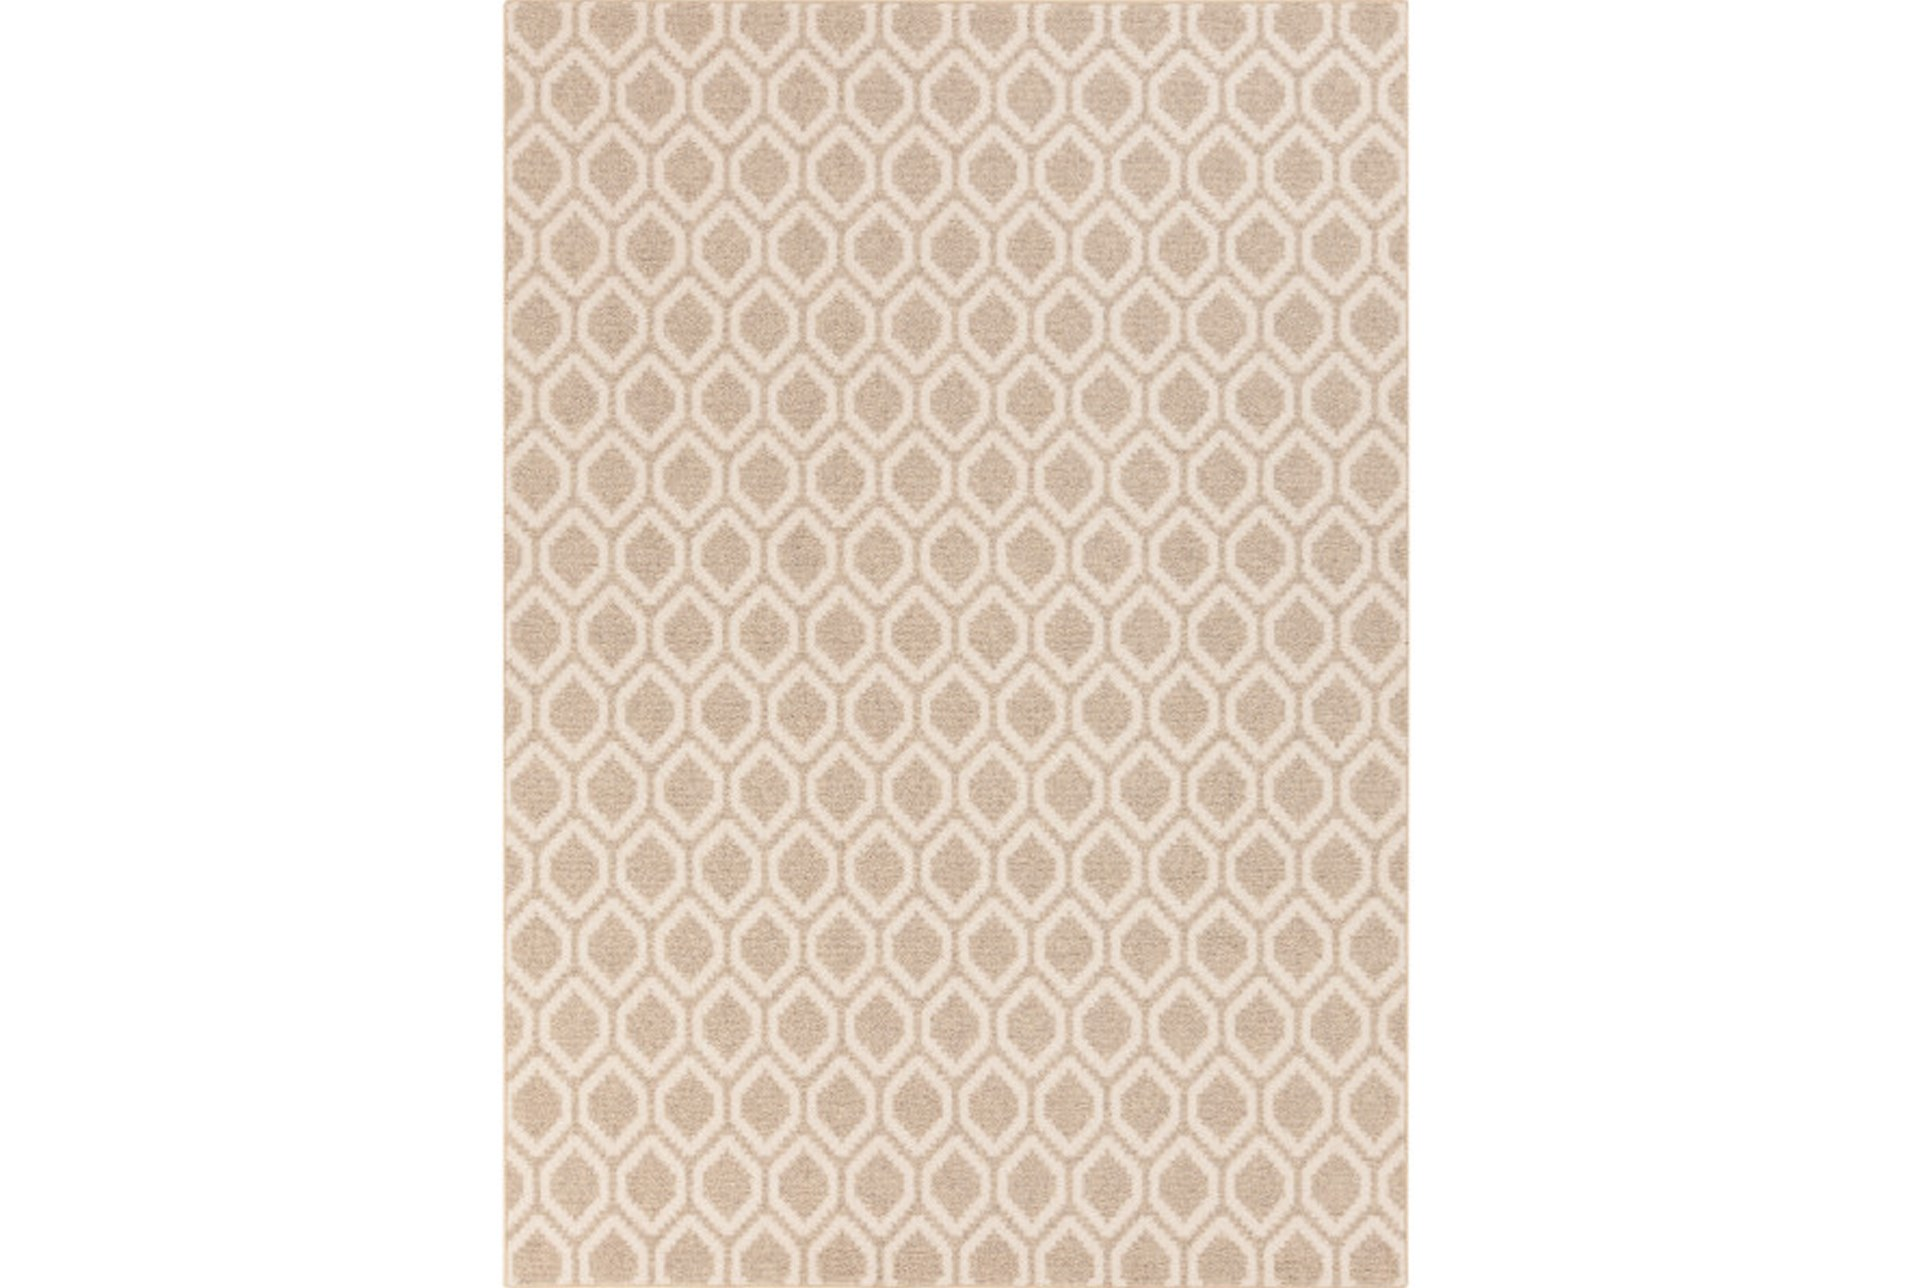 60x96 Rug Gisella Beige Ivory Living Spaces